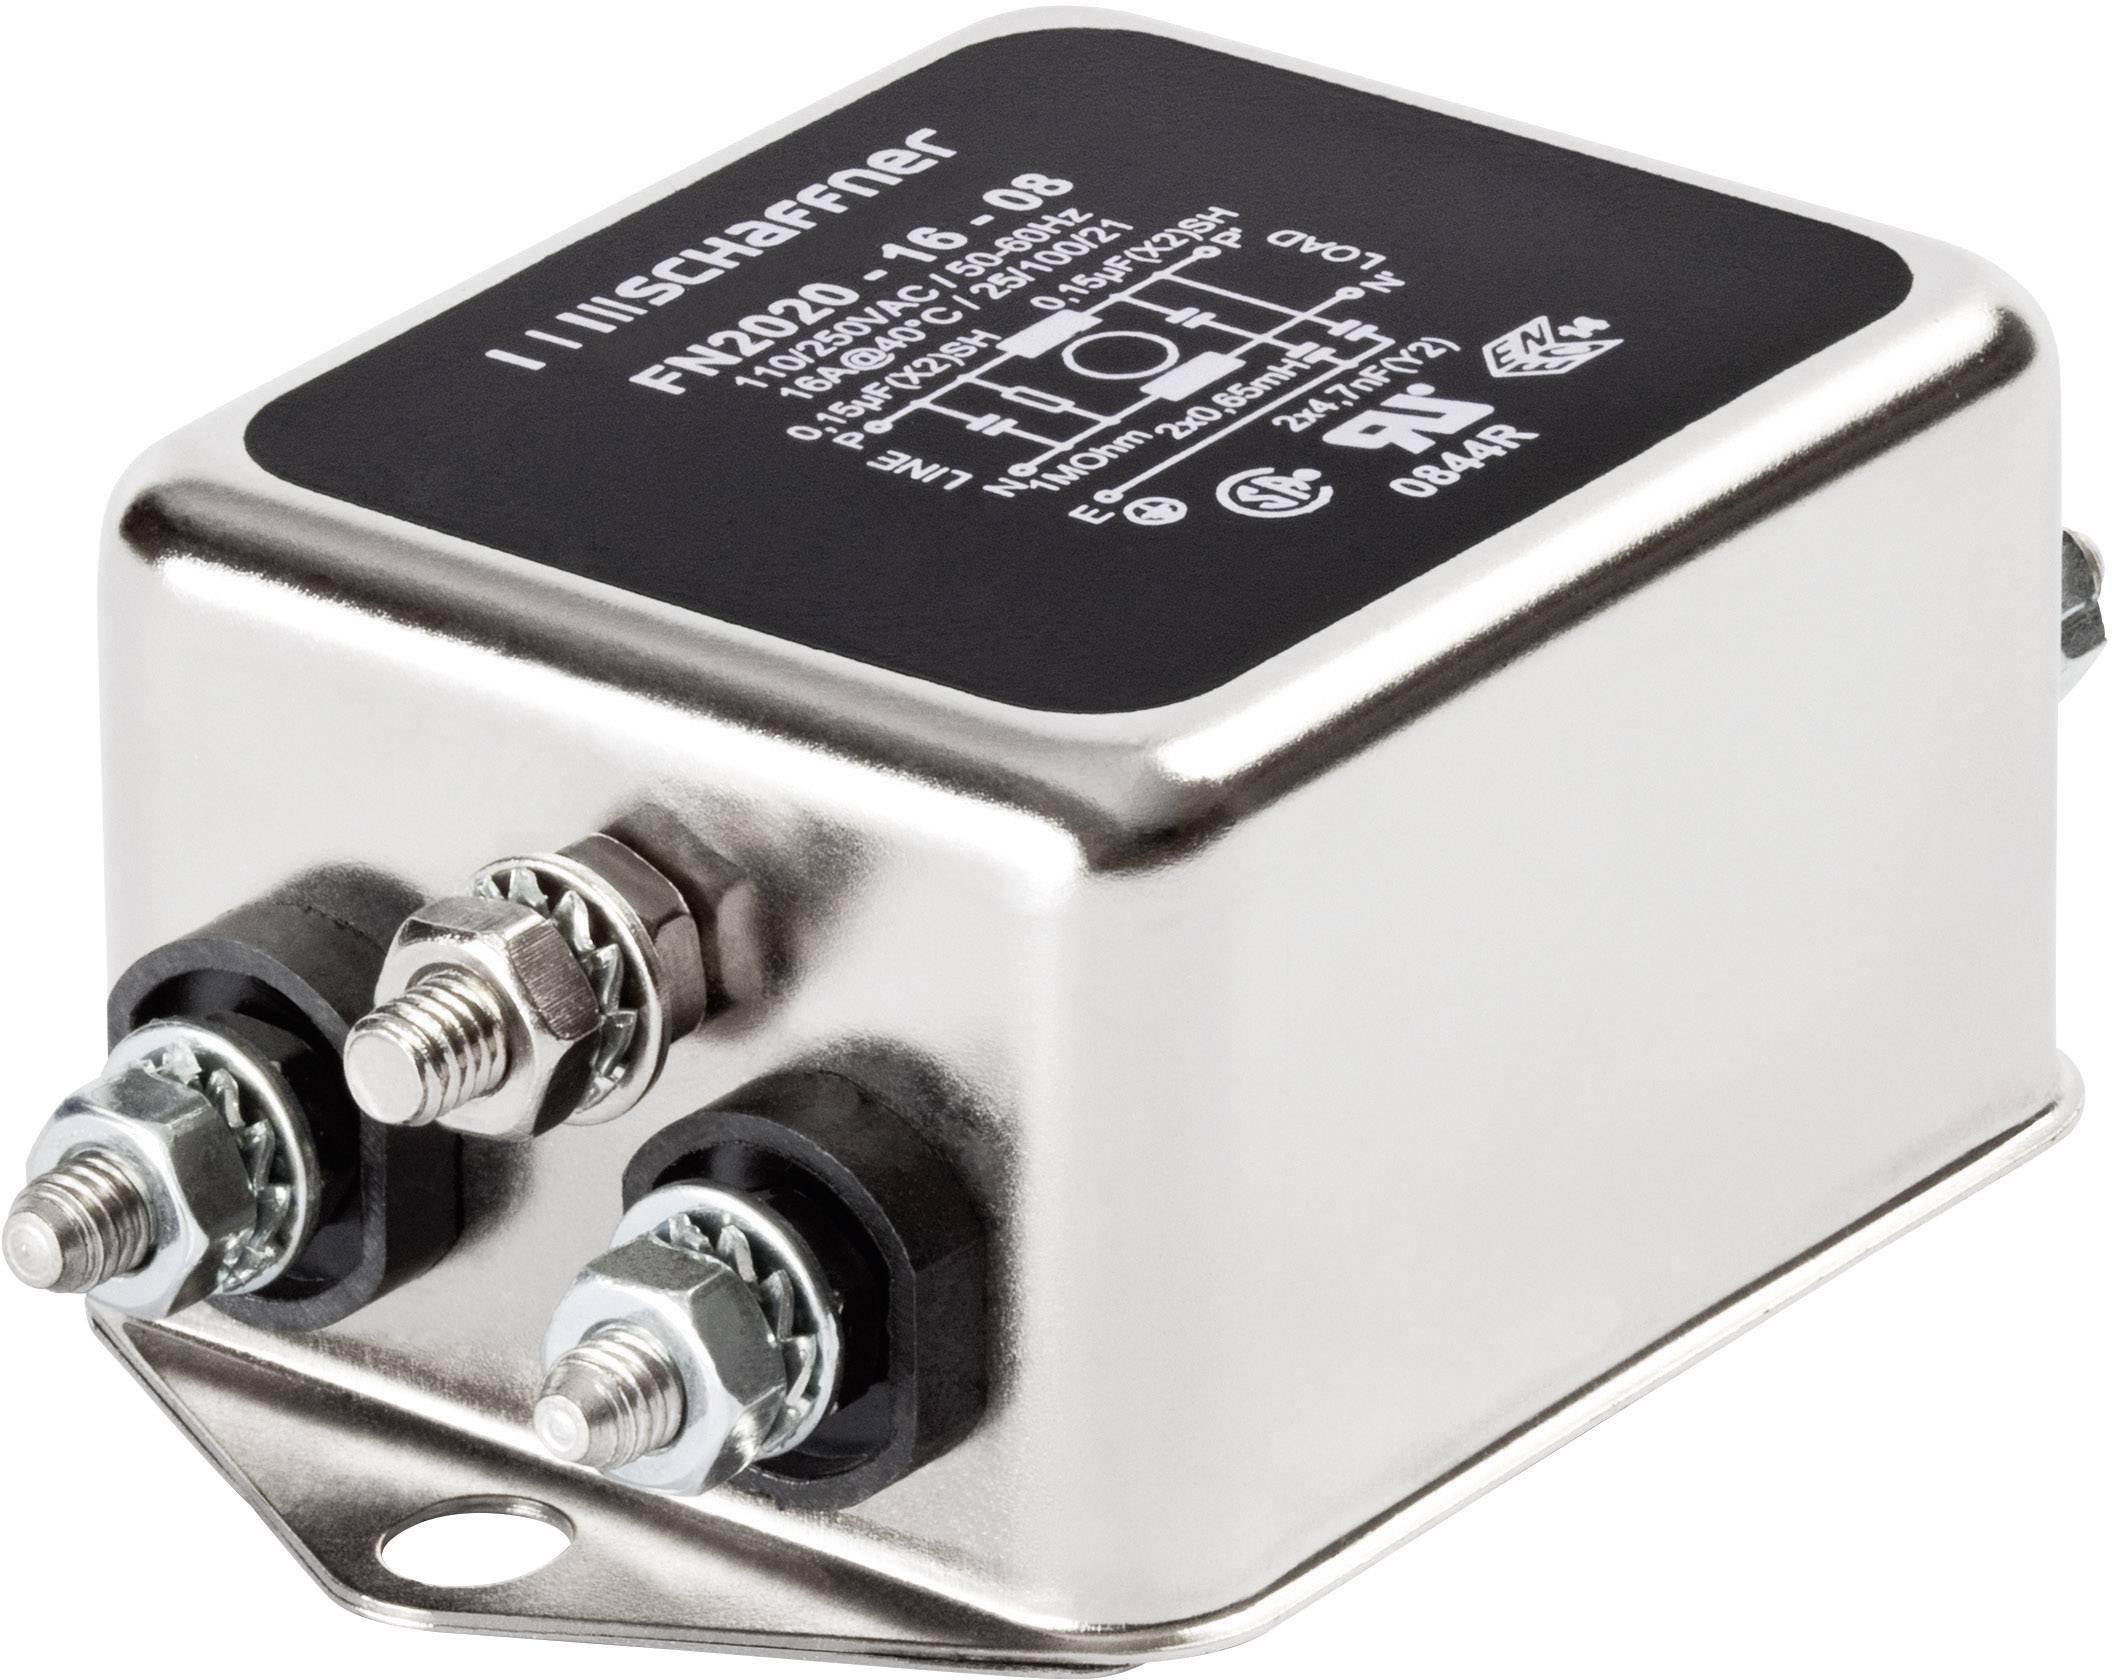 Síťový filtr Schaffner, FN 2020-10-06, 0,8 mH, 250 V/AC, 10 A